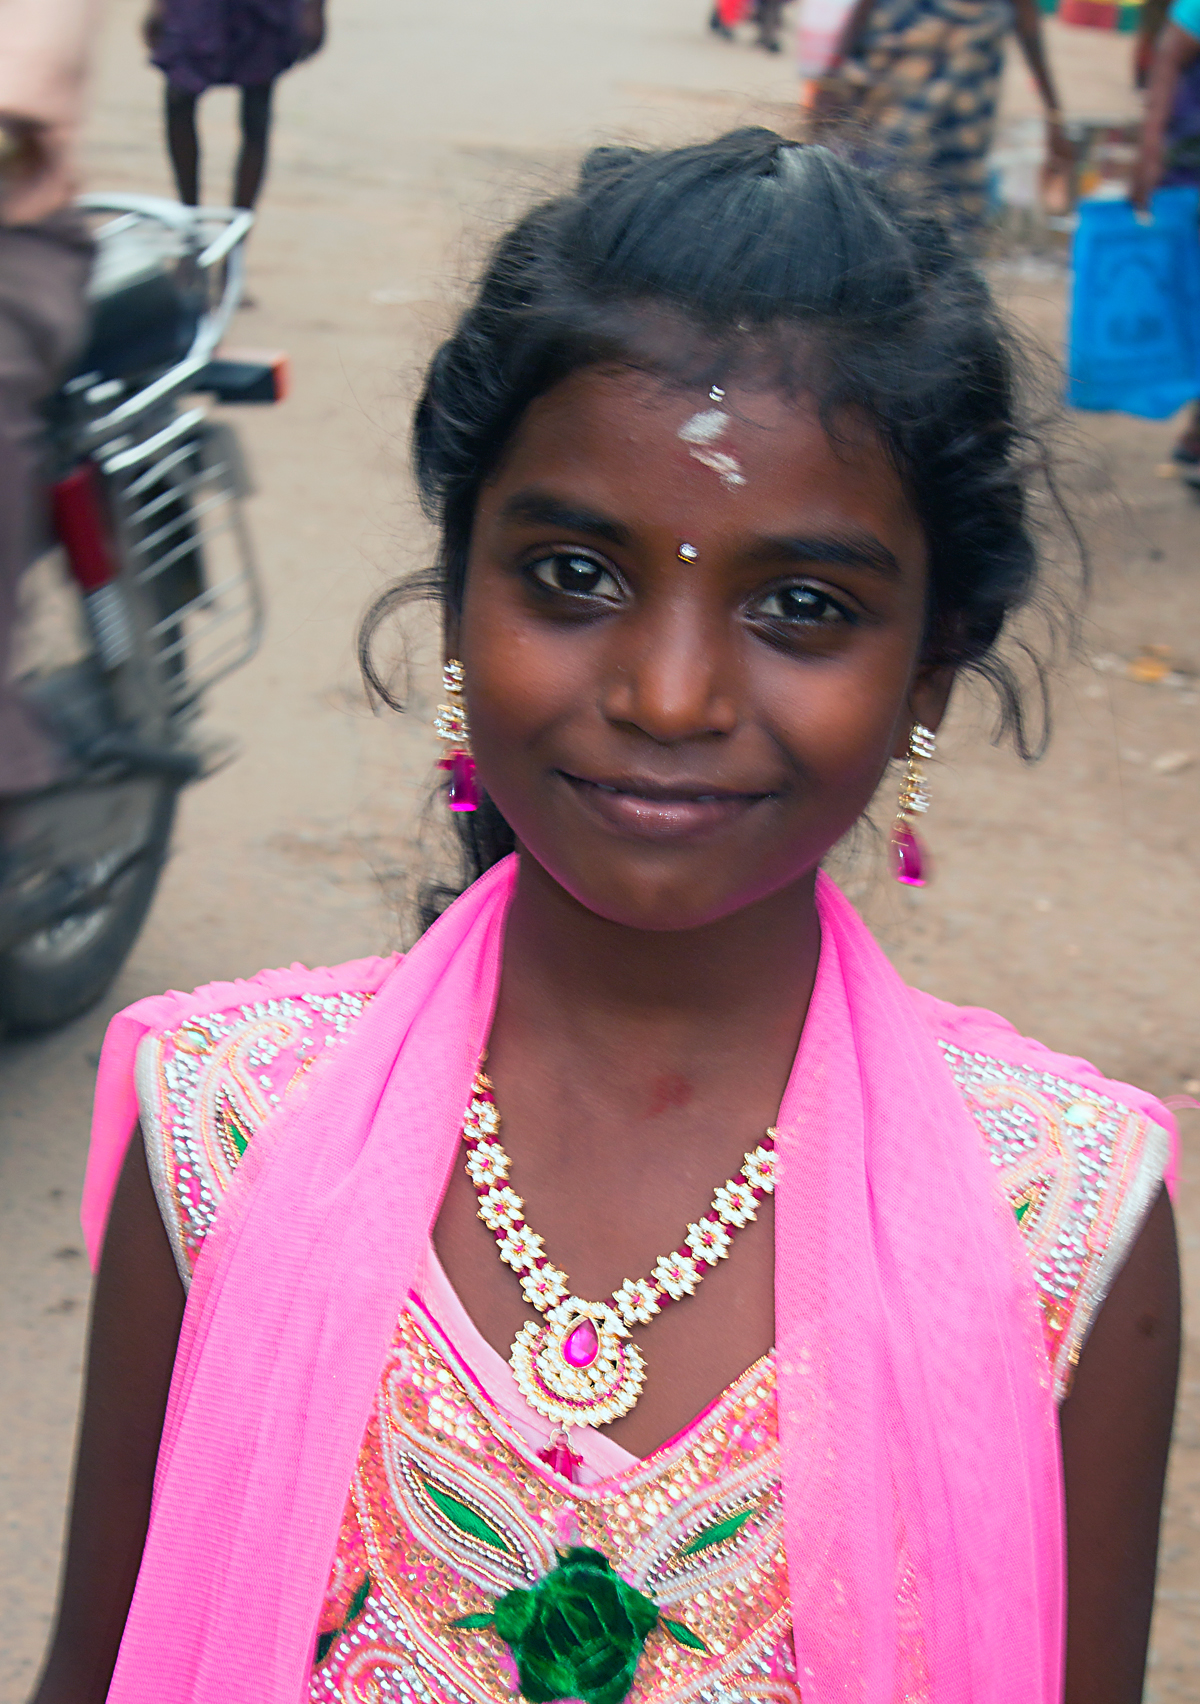 INDIEN Chennai Kanchipuram Tempel Menschen Tempel FINEST-onTour 7777.jpg